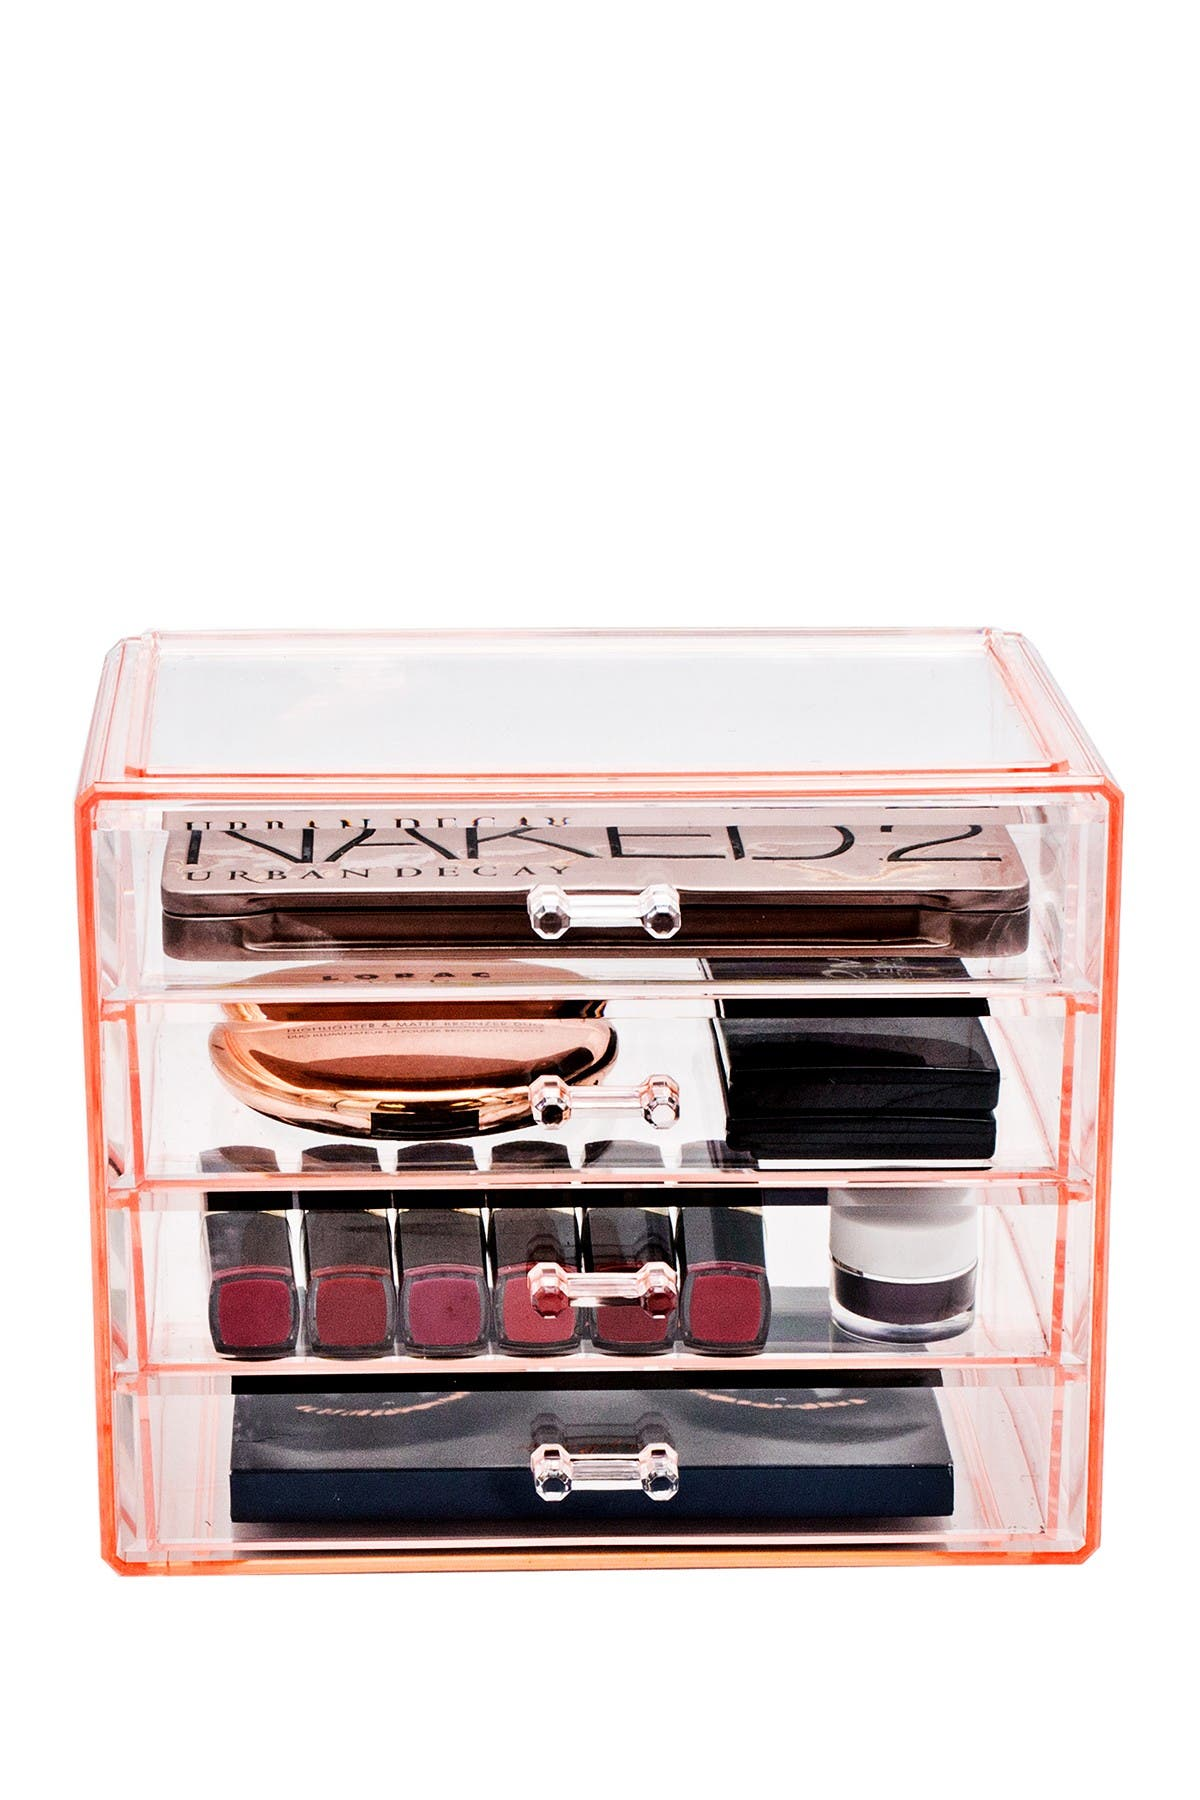 Image of Sorbus Pink Makeup & Jewelry Storage Case Display